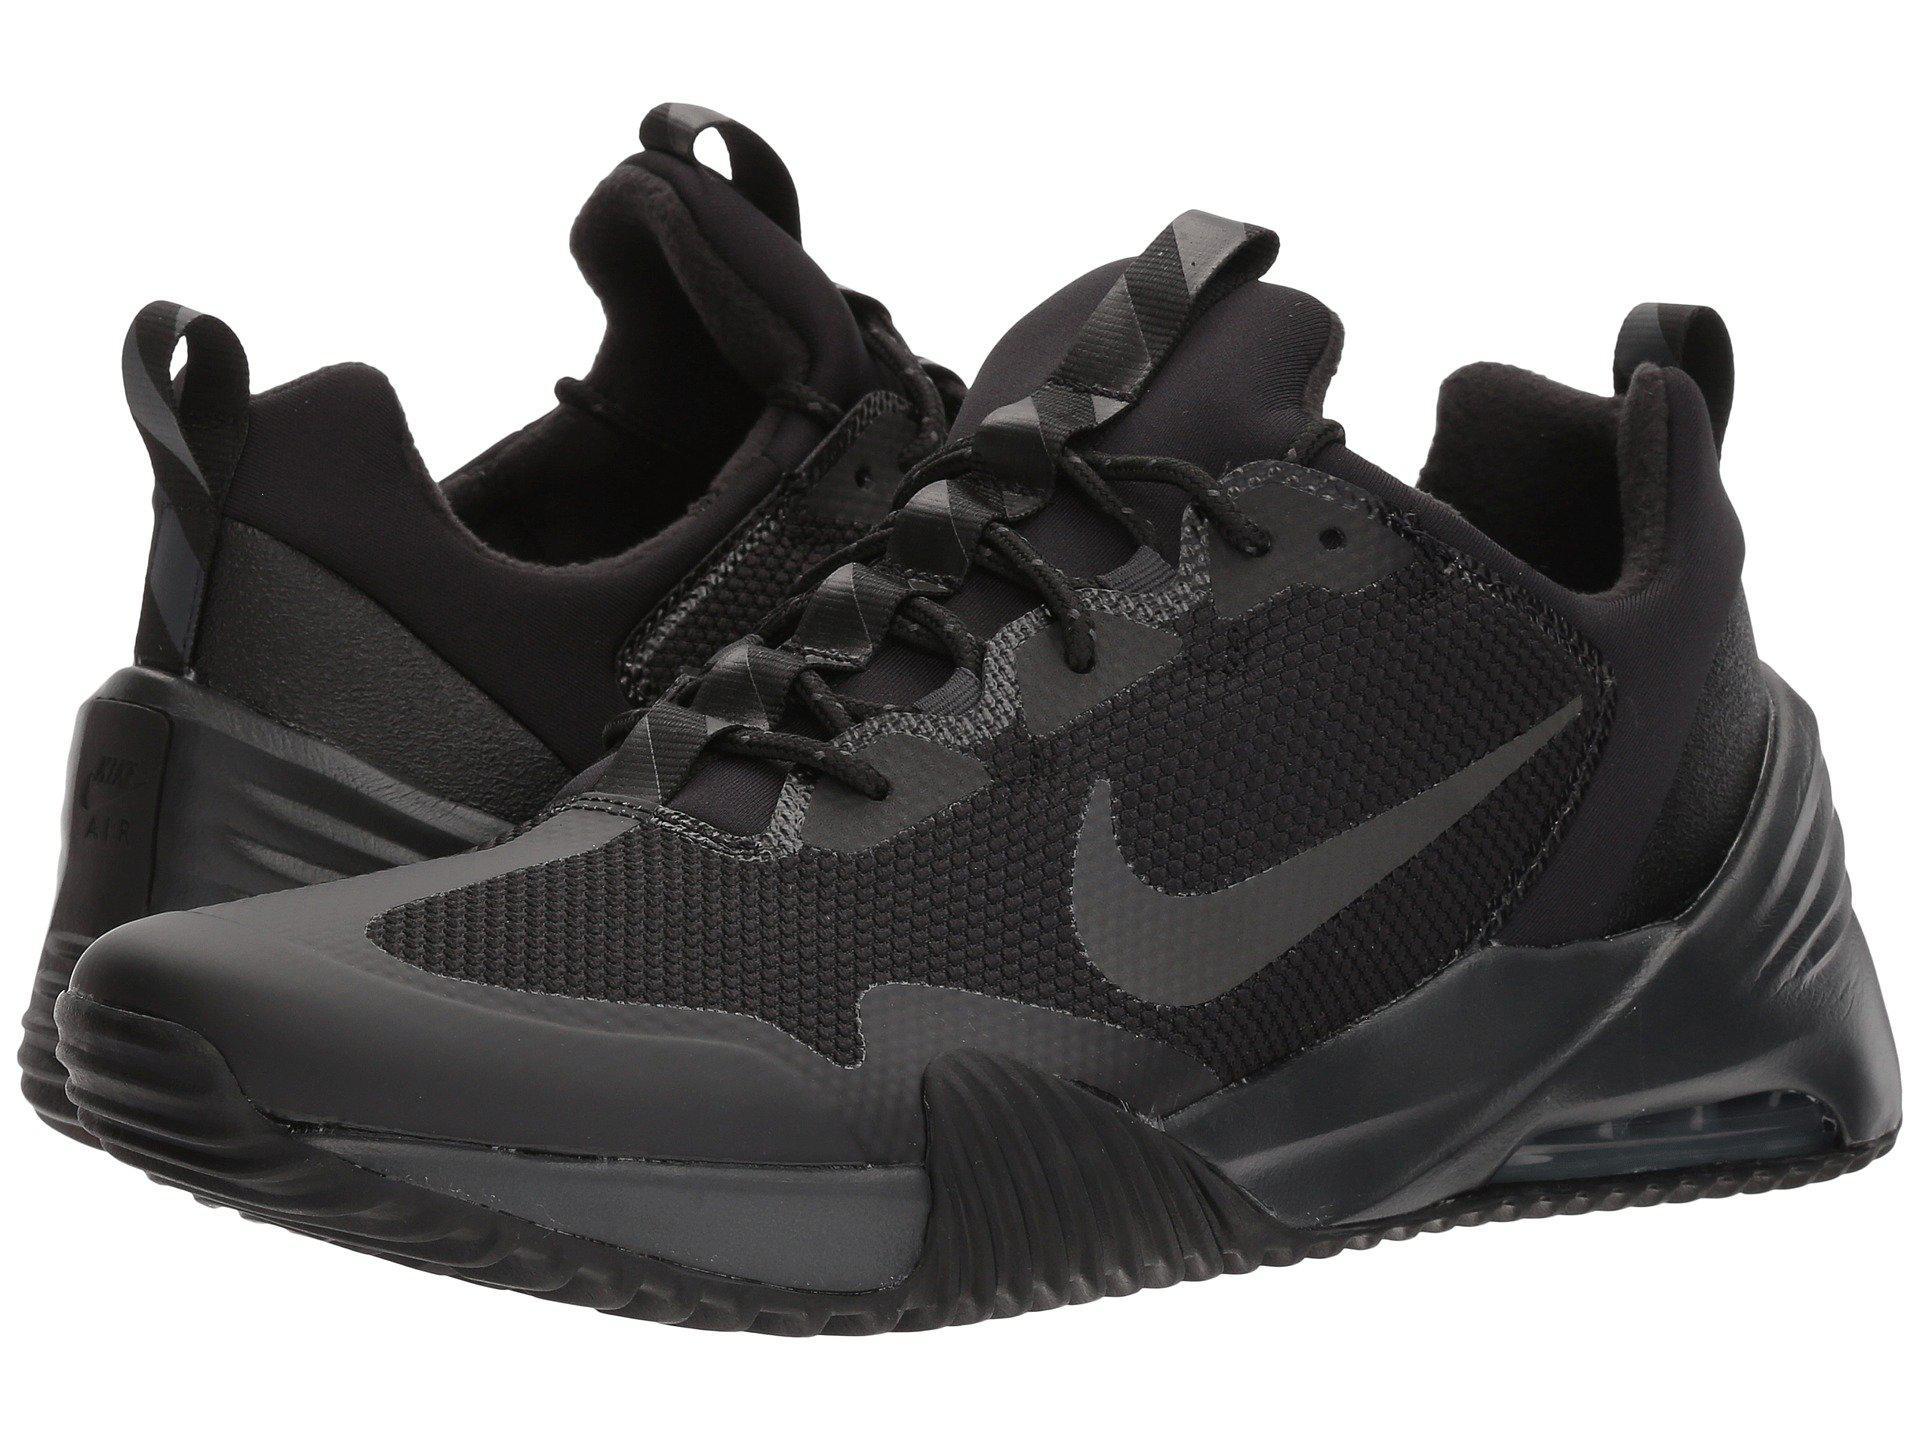 2eab2c410131 Lyst - Nike Air Max Grigora in Black for Men - Save 43%